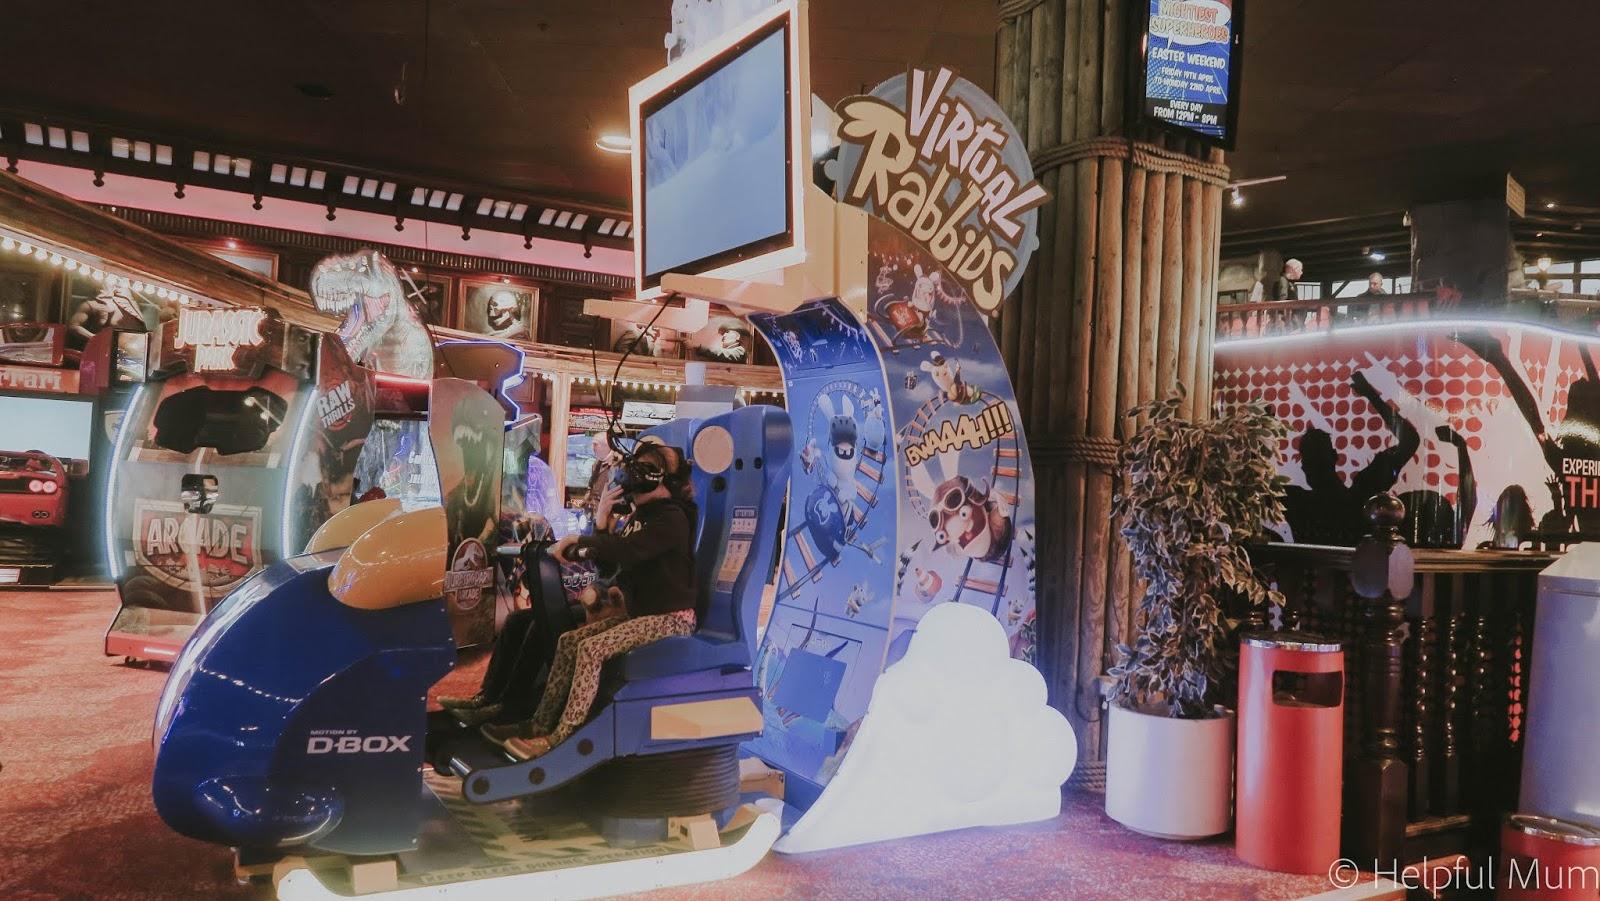 VR ride coral island Blackpool